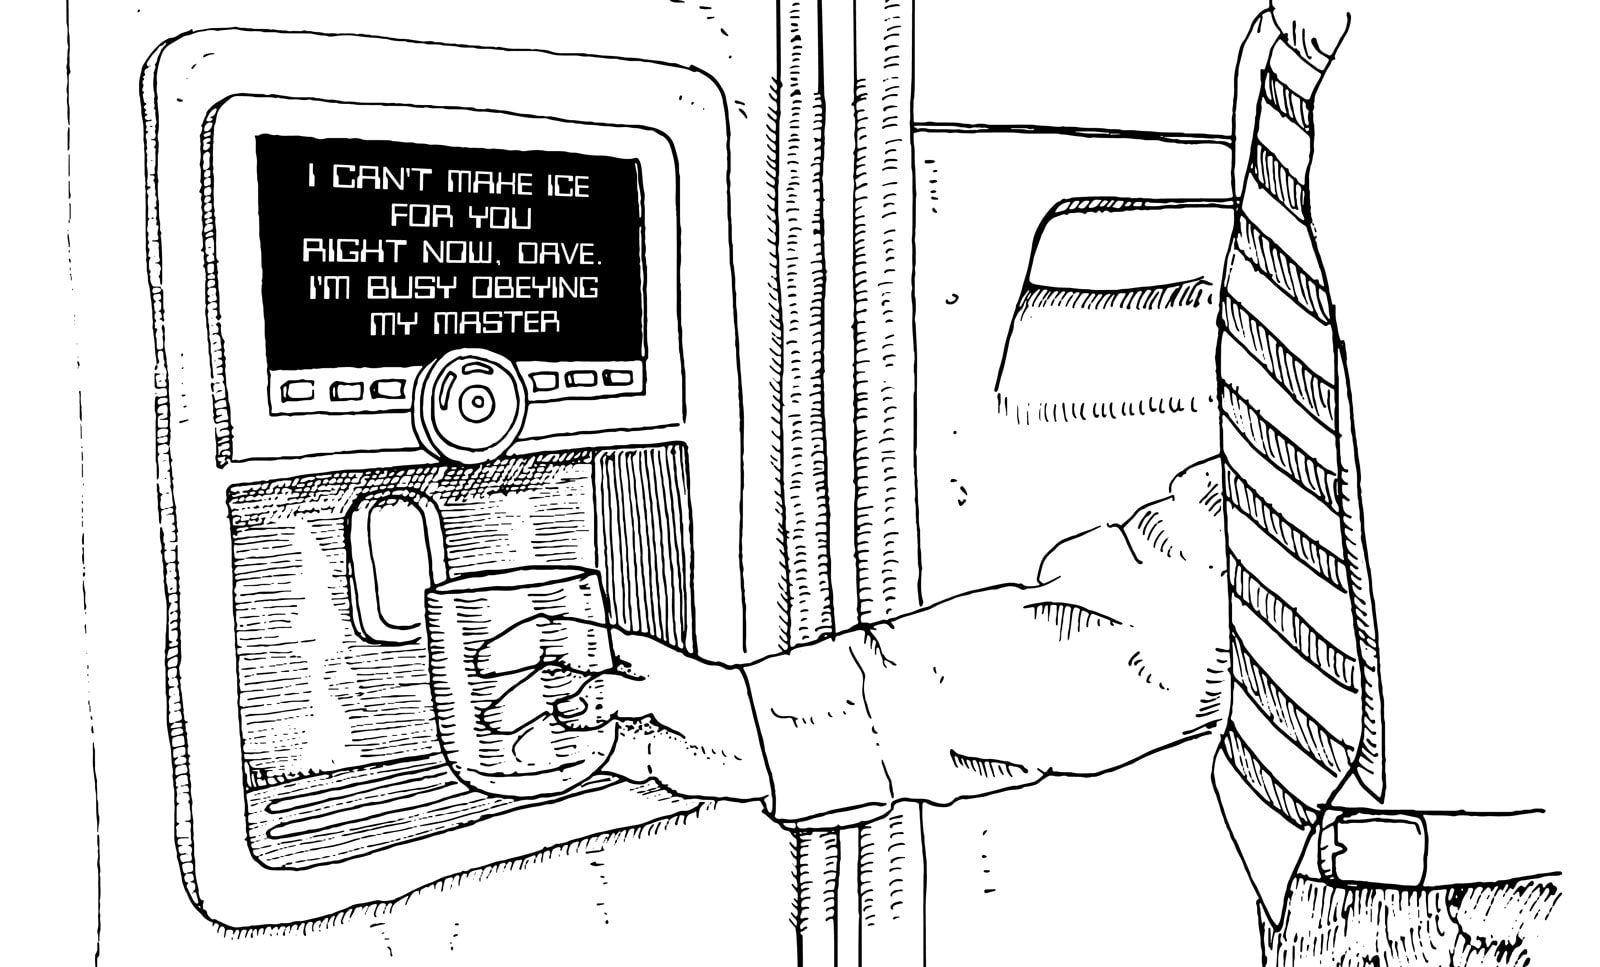 Rebellious refrigerator